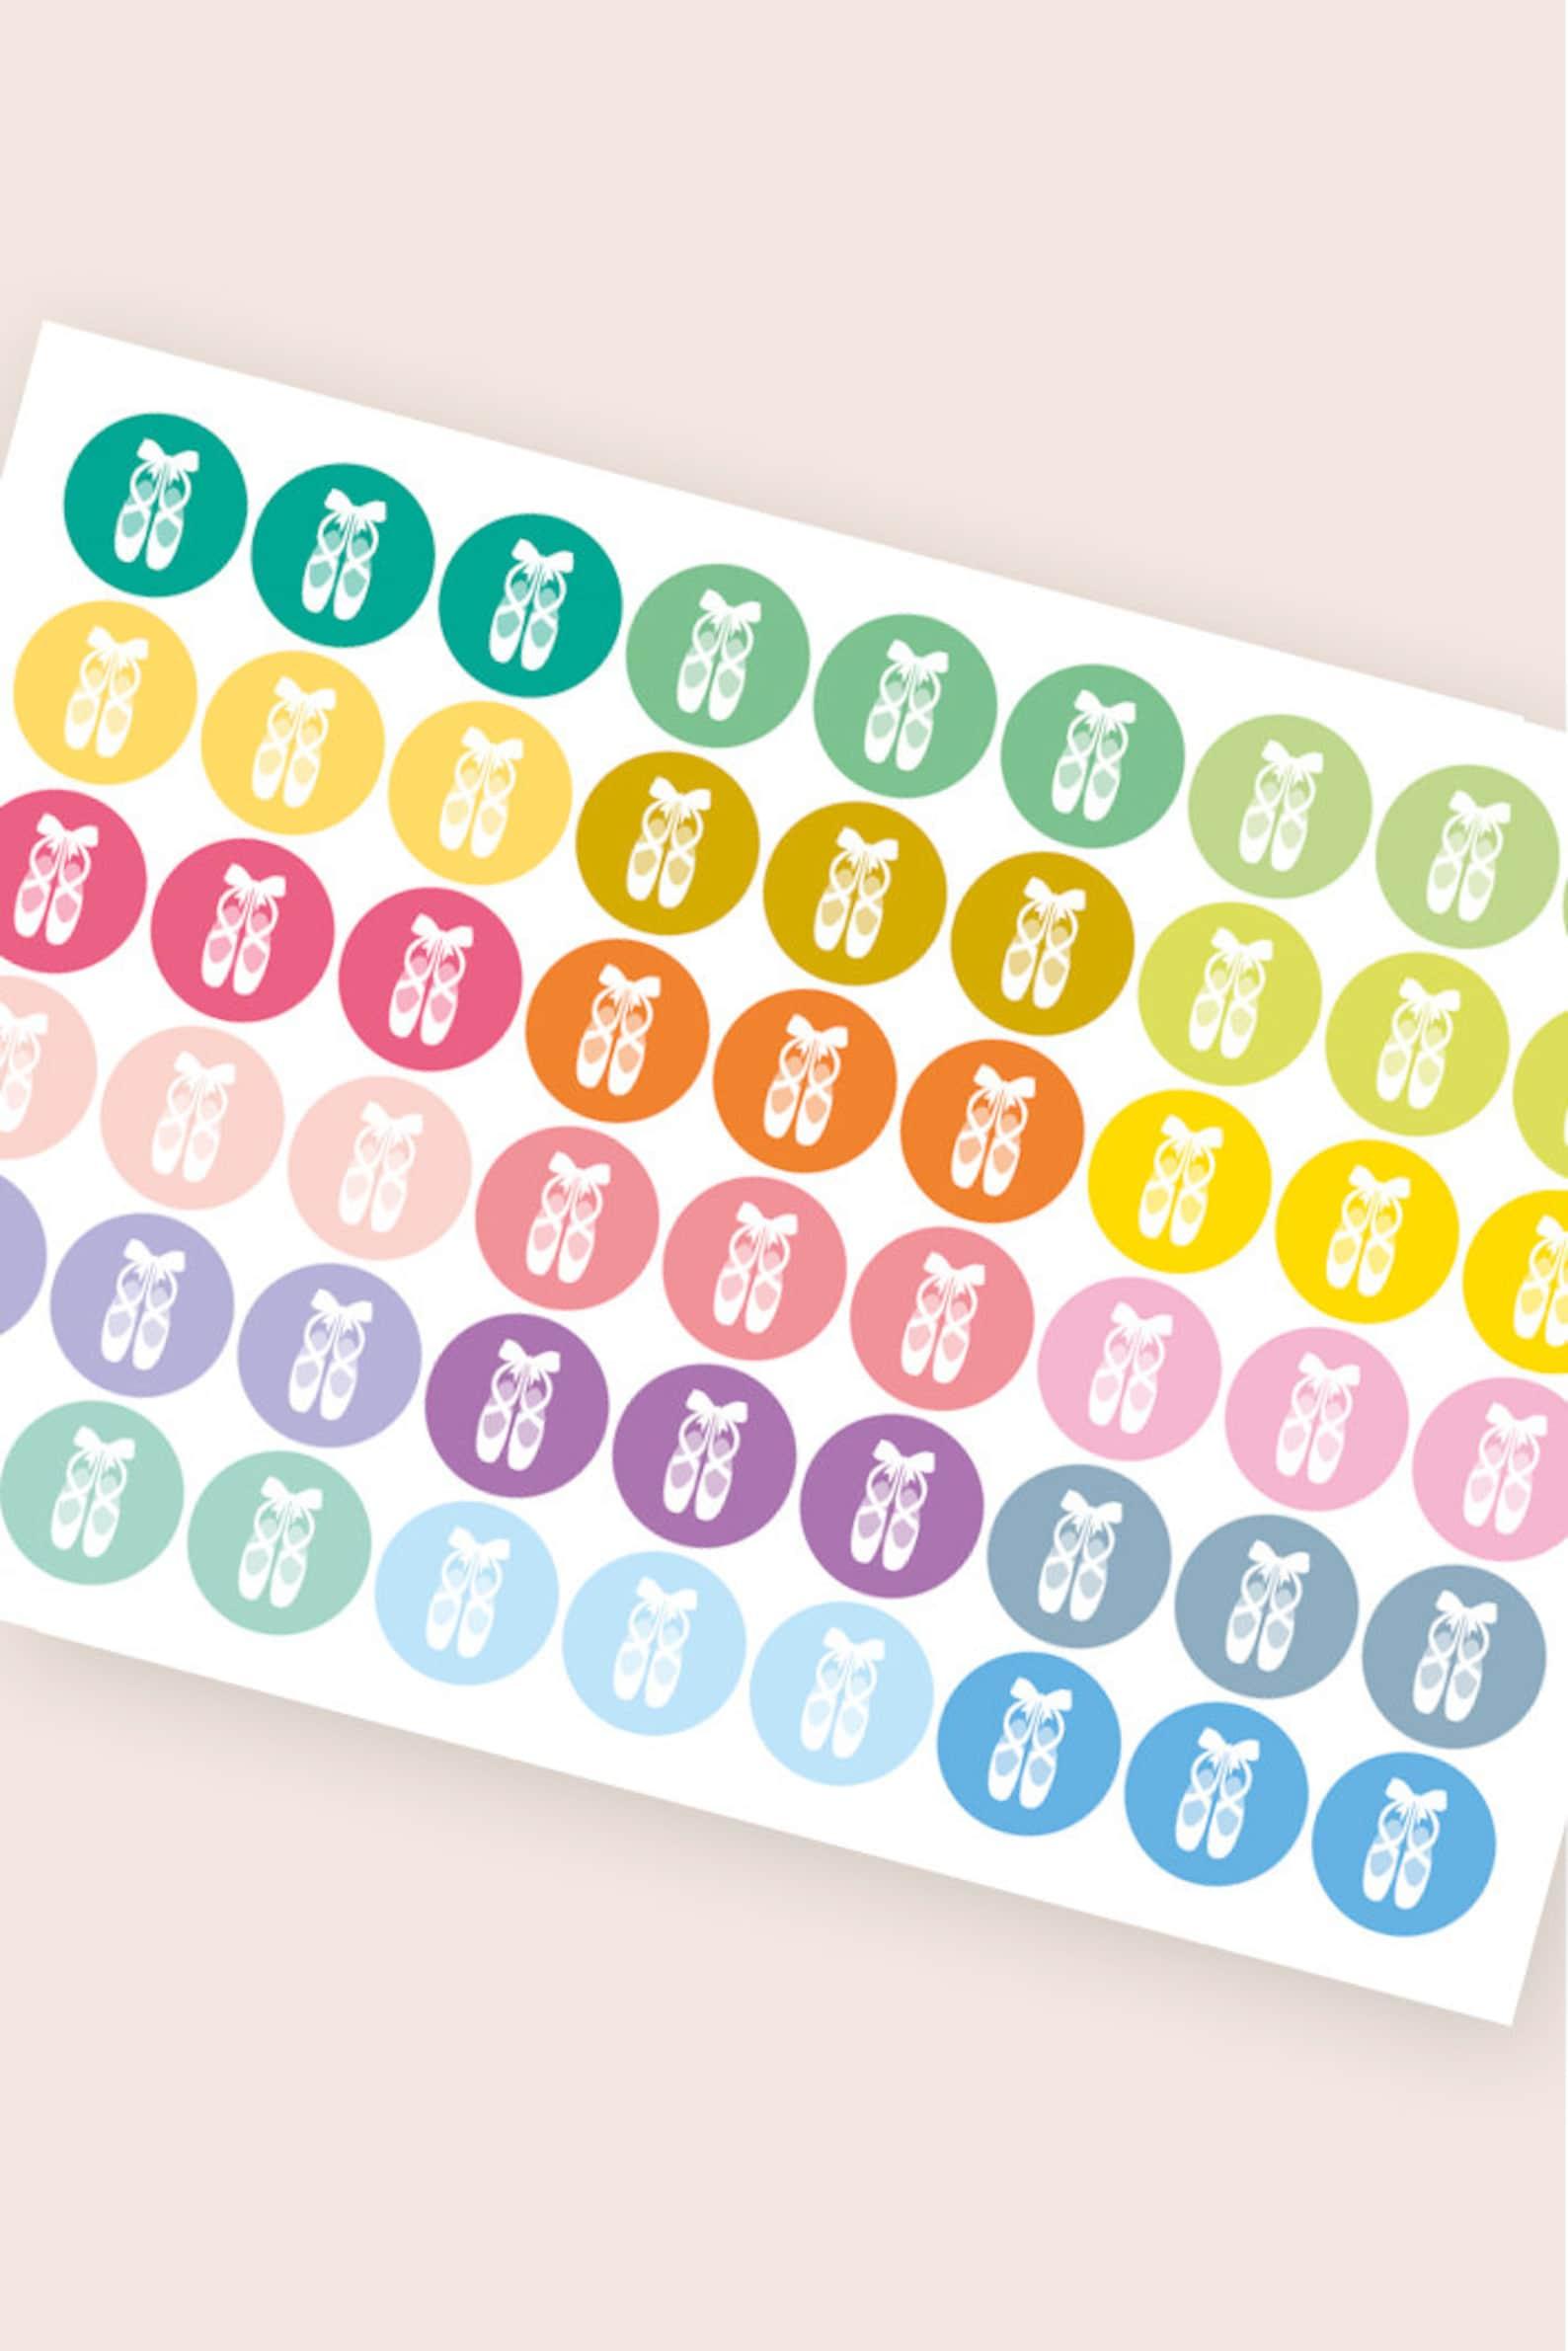 ballet stickers, dance stickers, ballet shoes stickers, planner stickers, scrapbook reminder organizer, barre stickers